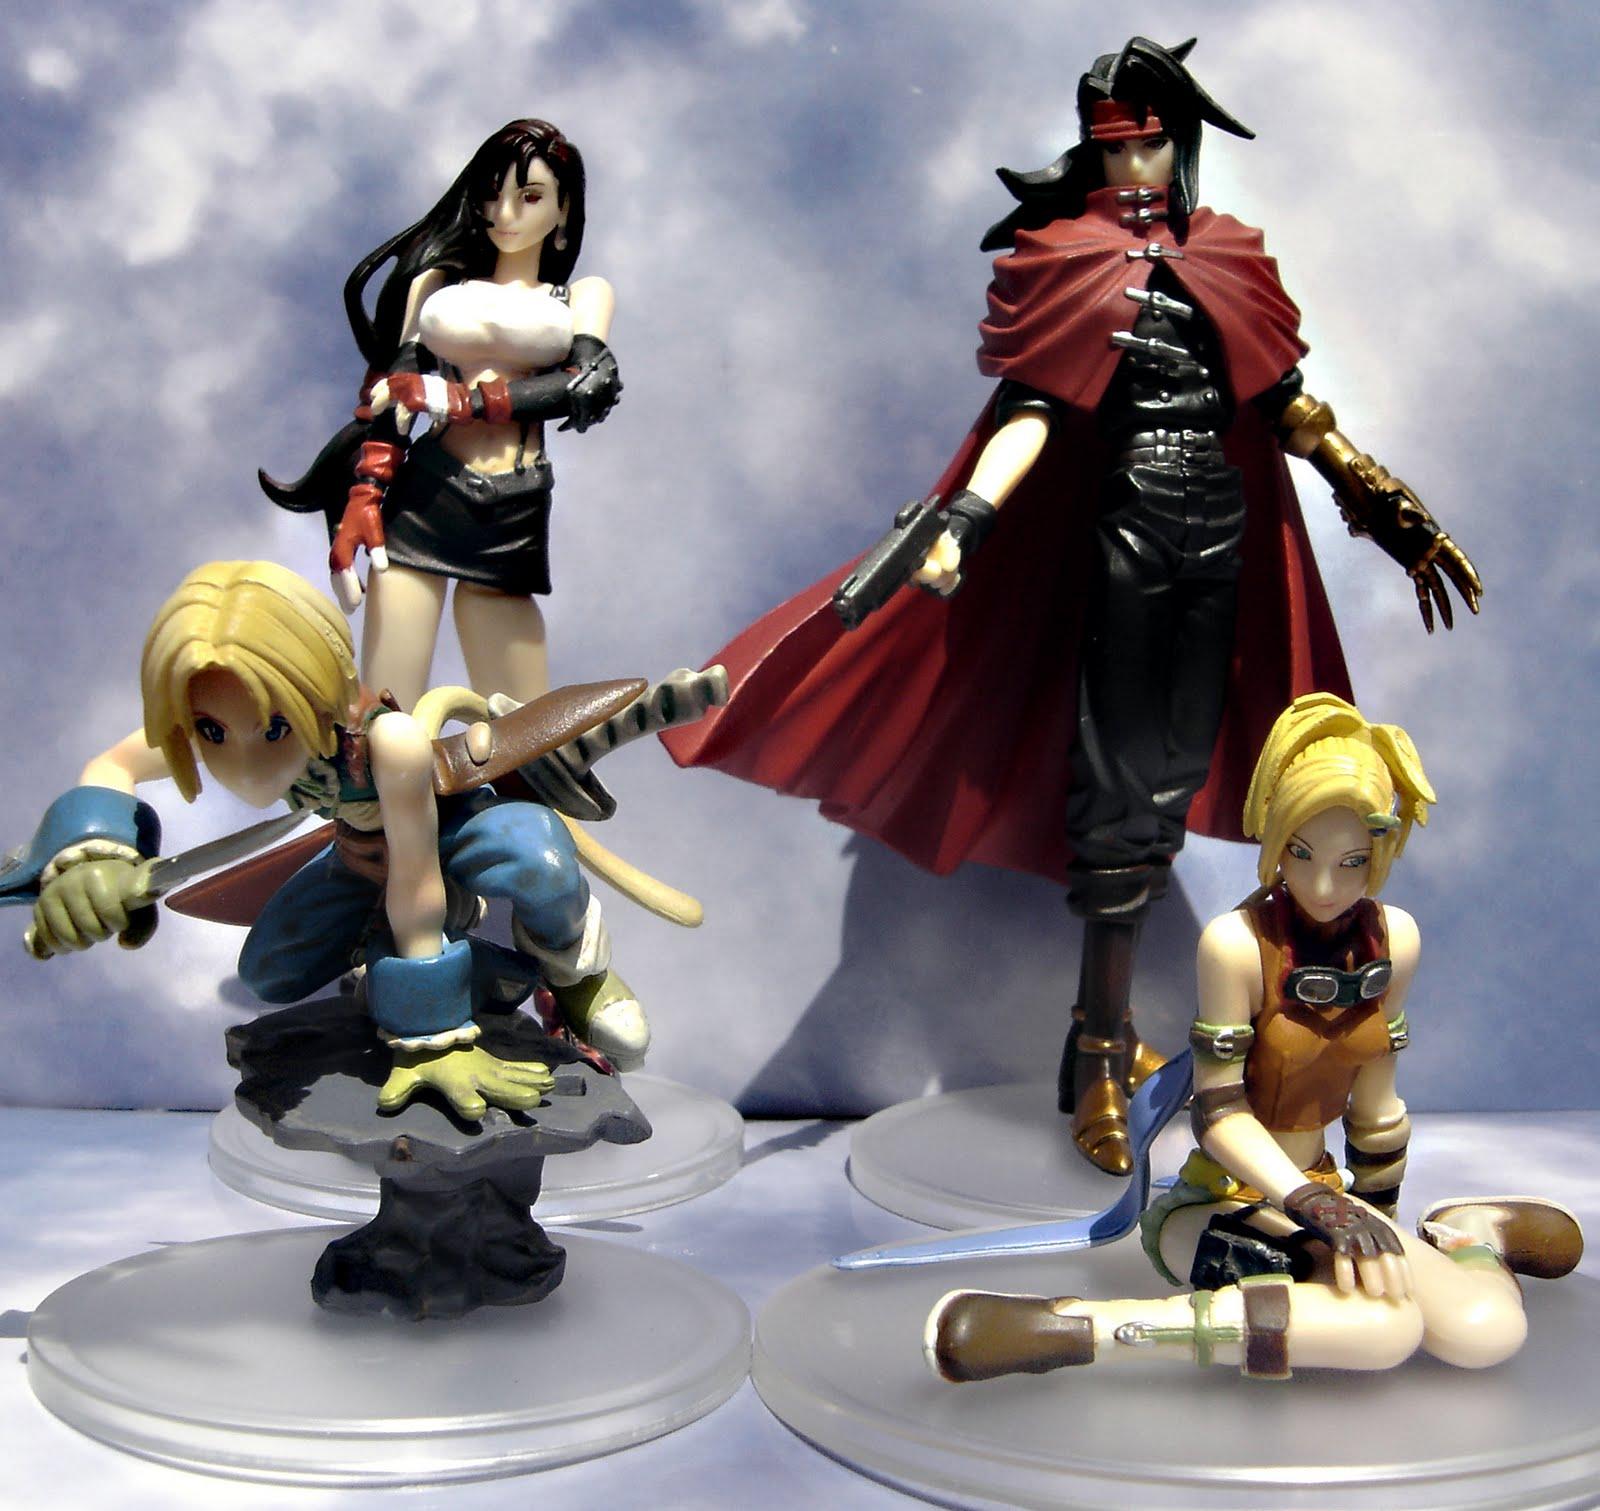 Soth's Blog: Final Fantasy Trading Arts For Sale